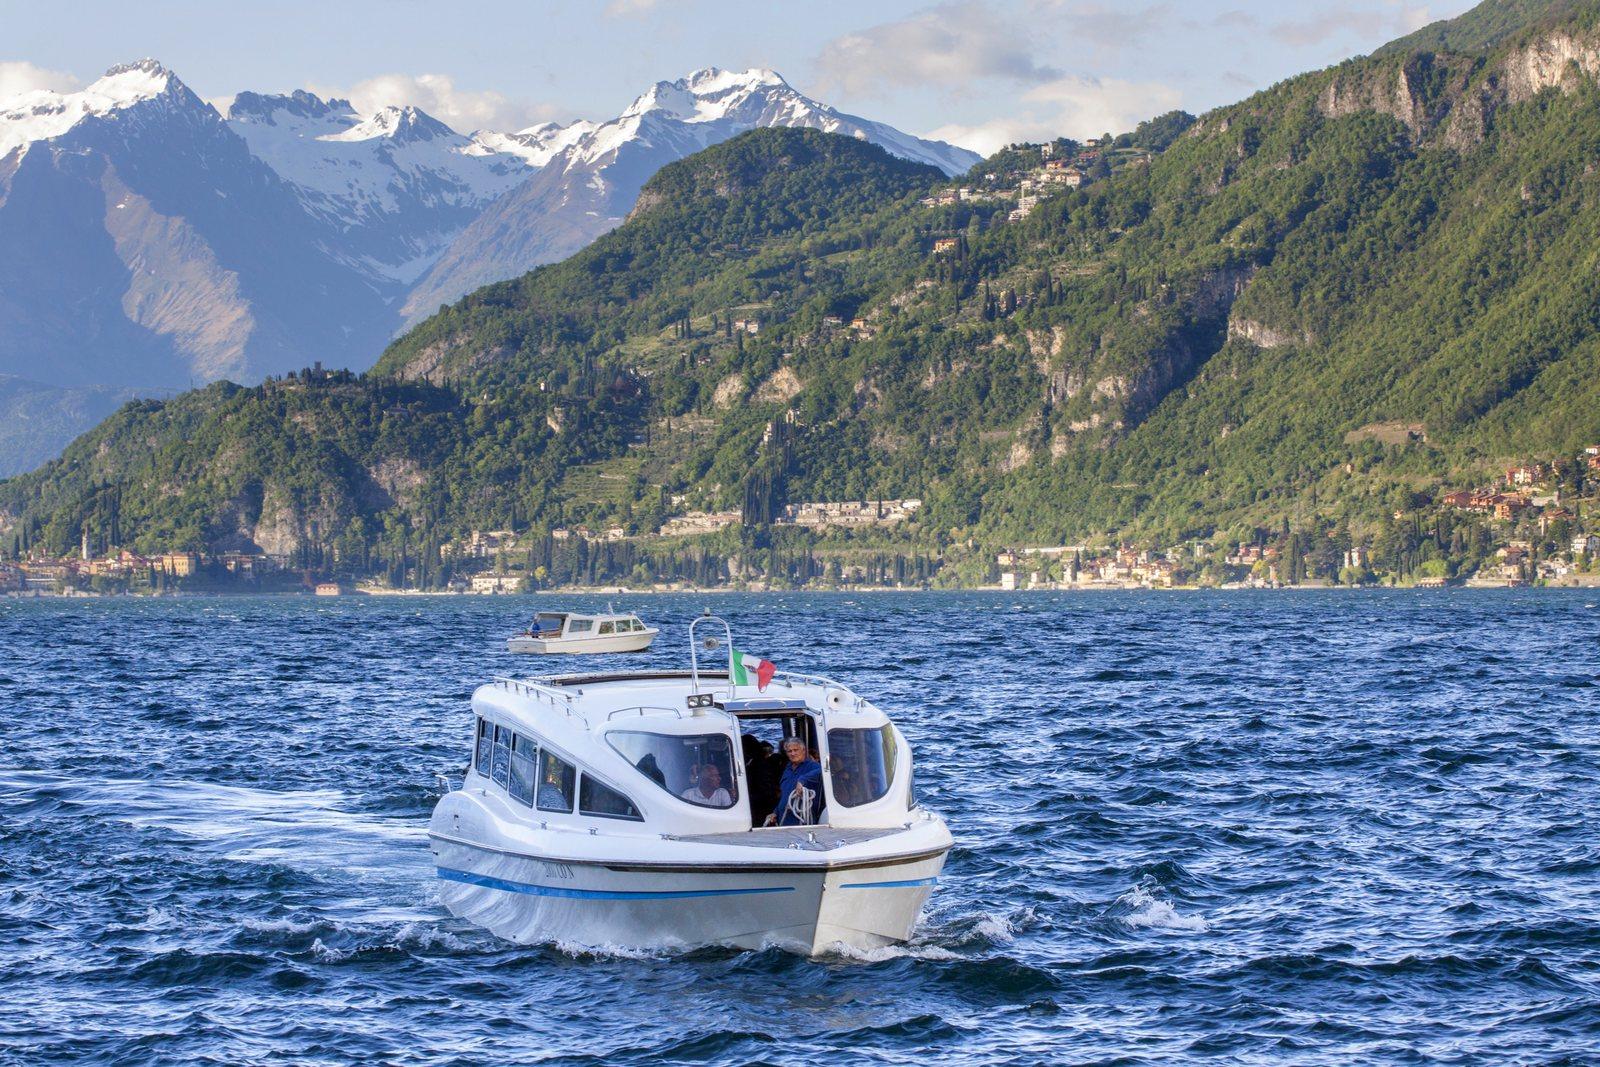 boat transportation for wedding in villa corte del lago